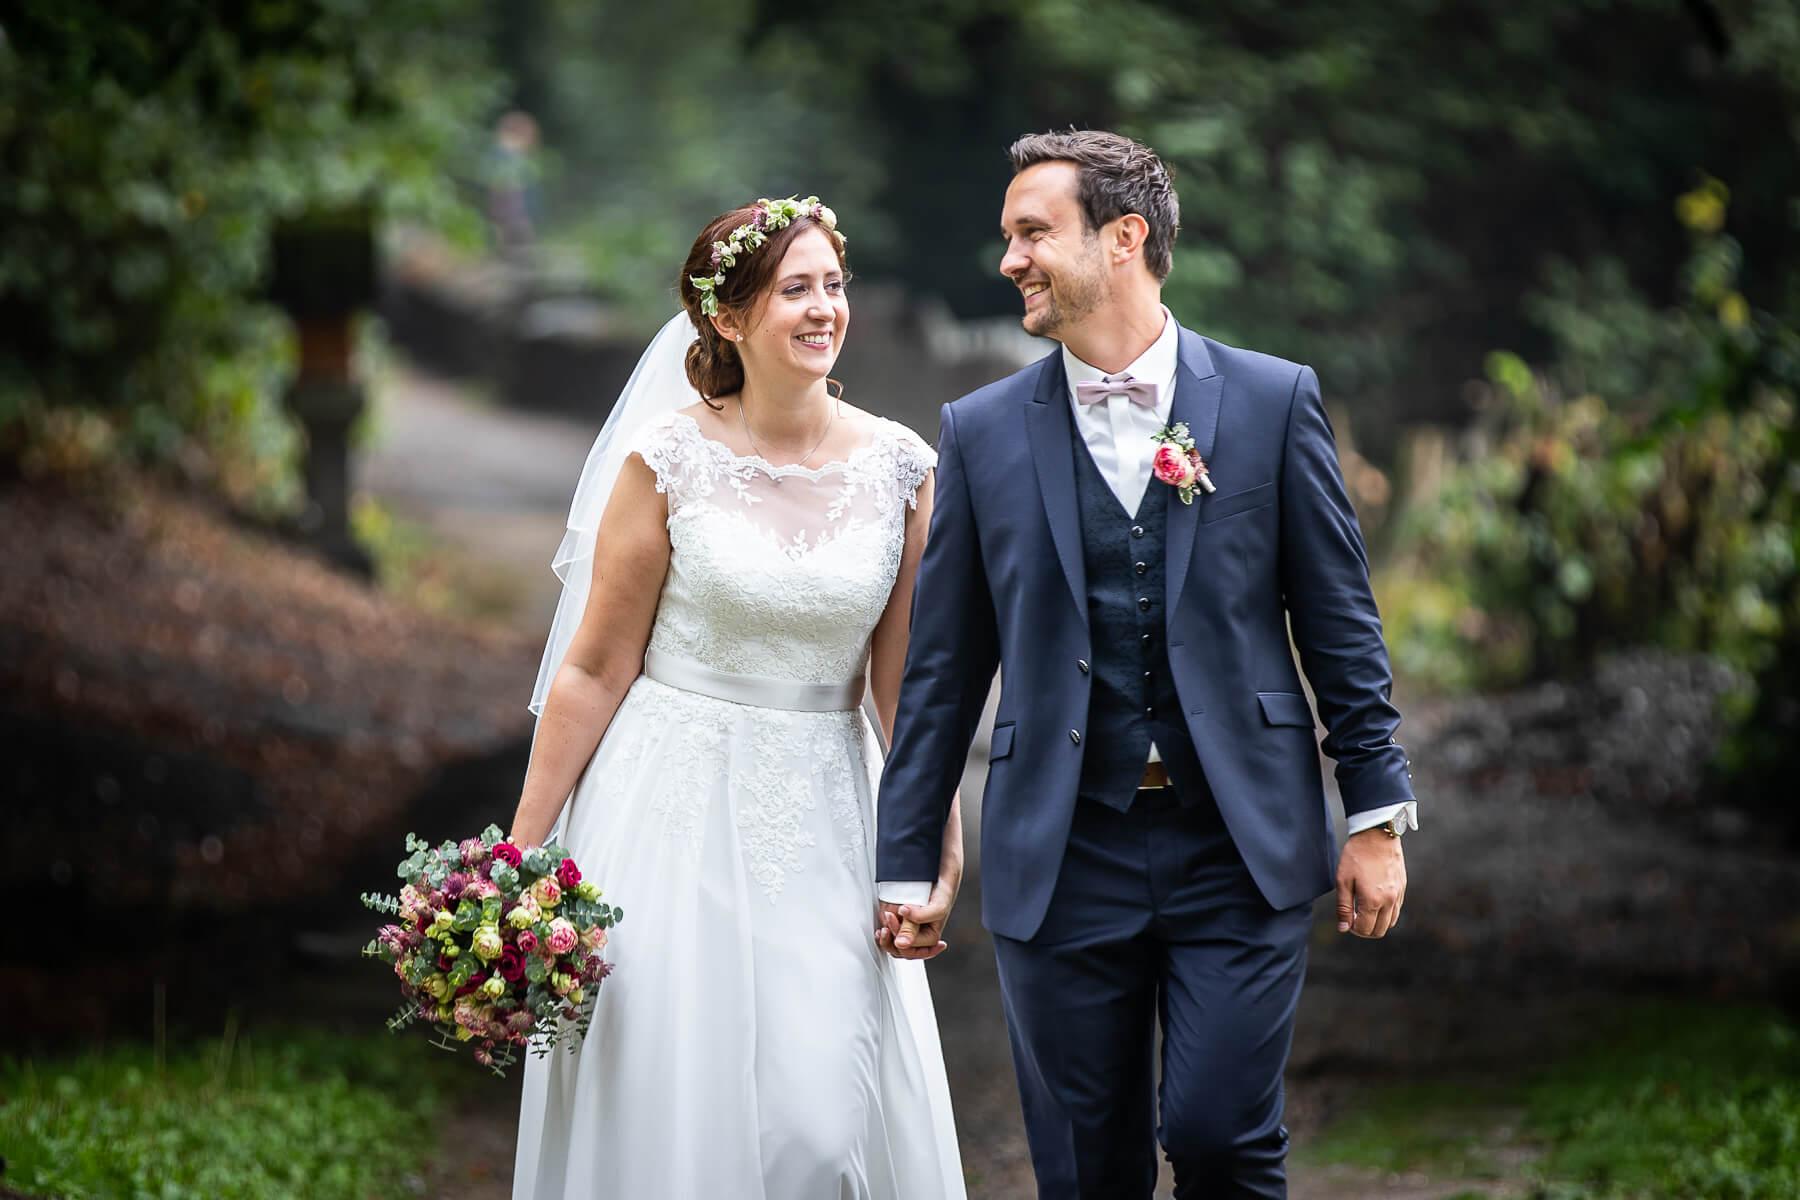 Hochzeitsreportage  Brautpaarshooting  Auermuehle  Ratingen 02